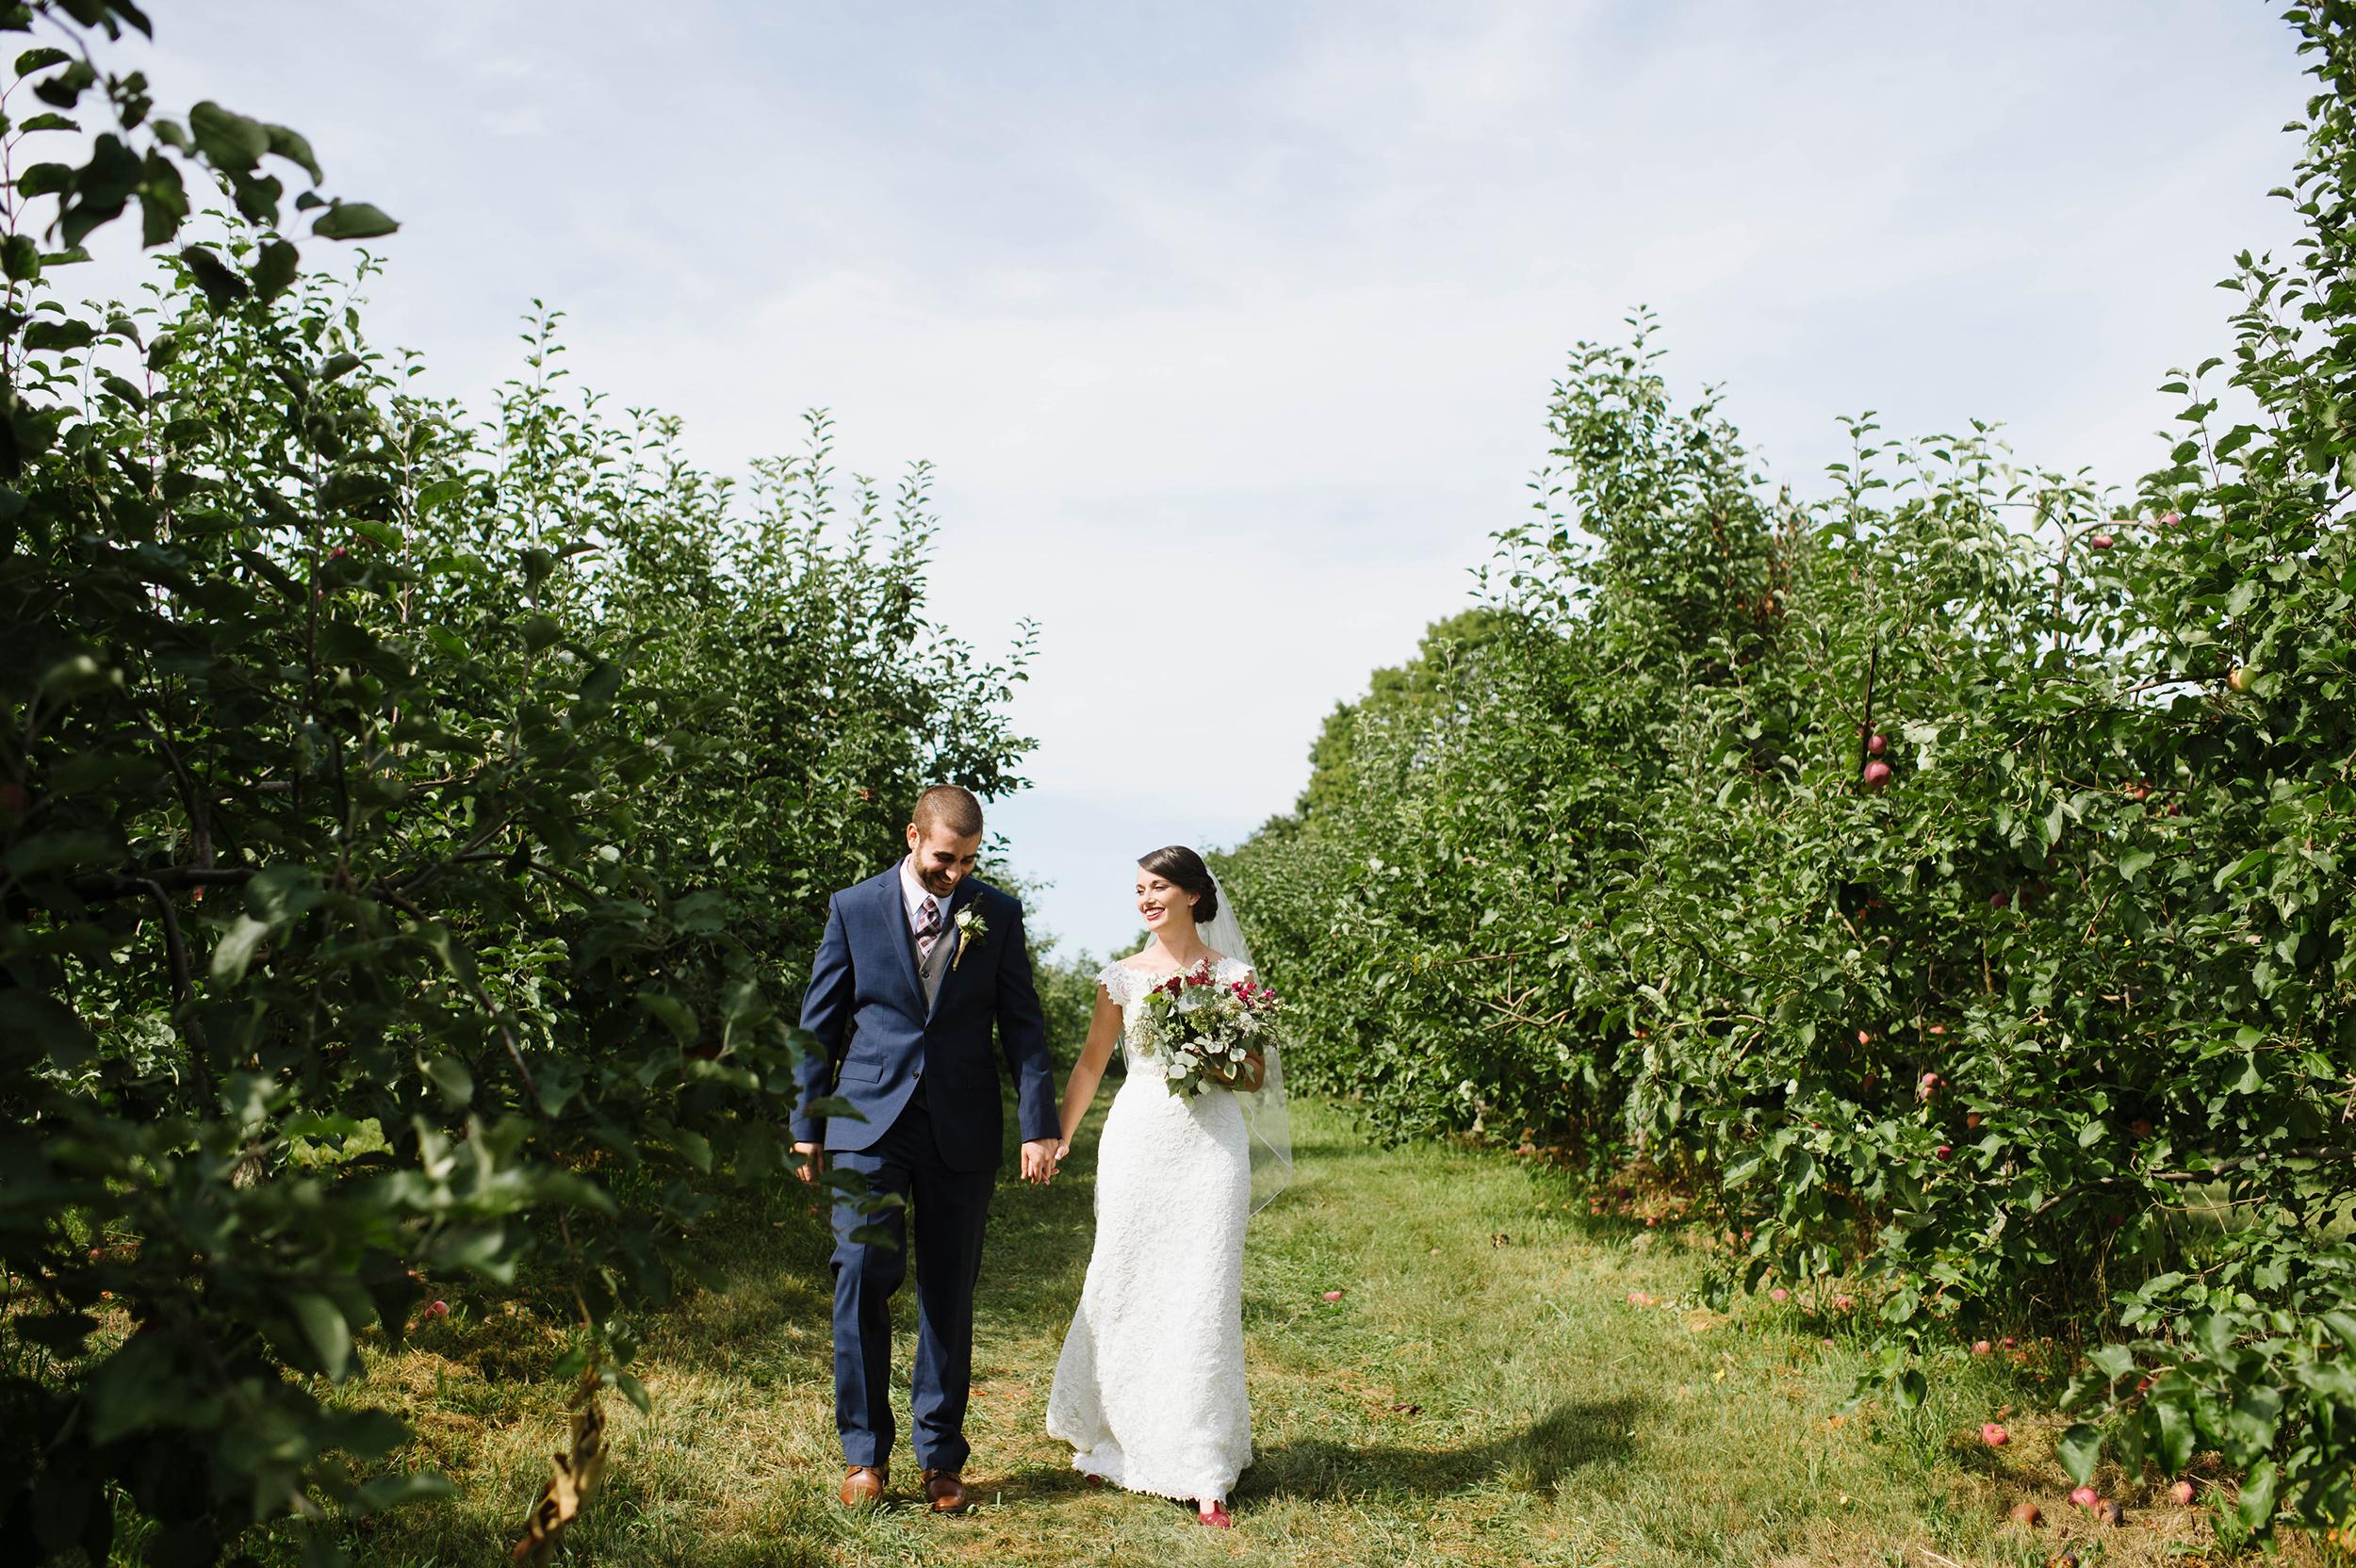 Quonquont-Farm-Wedding010.jpg